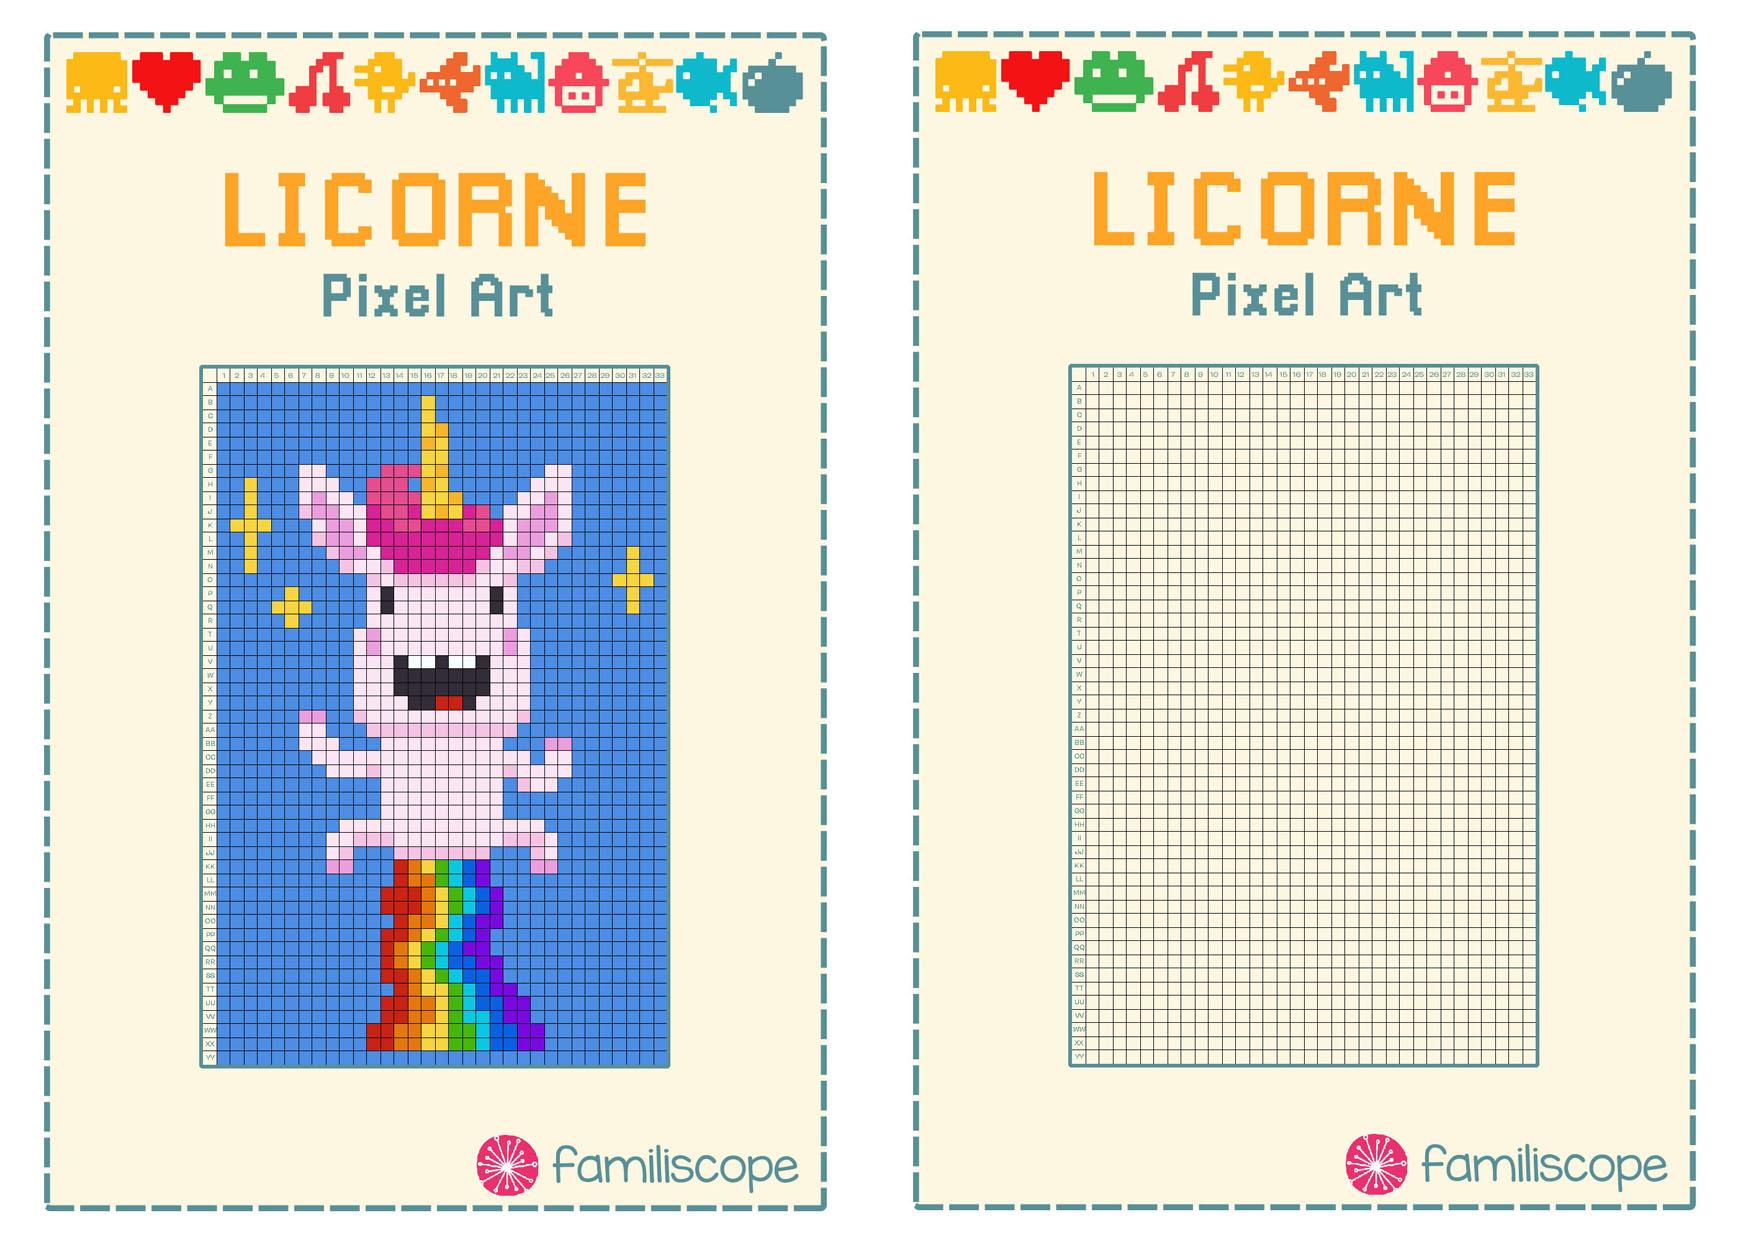 Pixel Art Licorne Arc-En-Ciel avec Modele Pixel Art A Imprimer